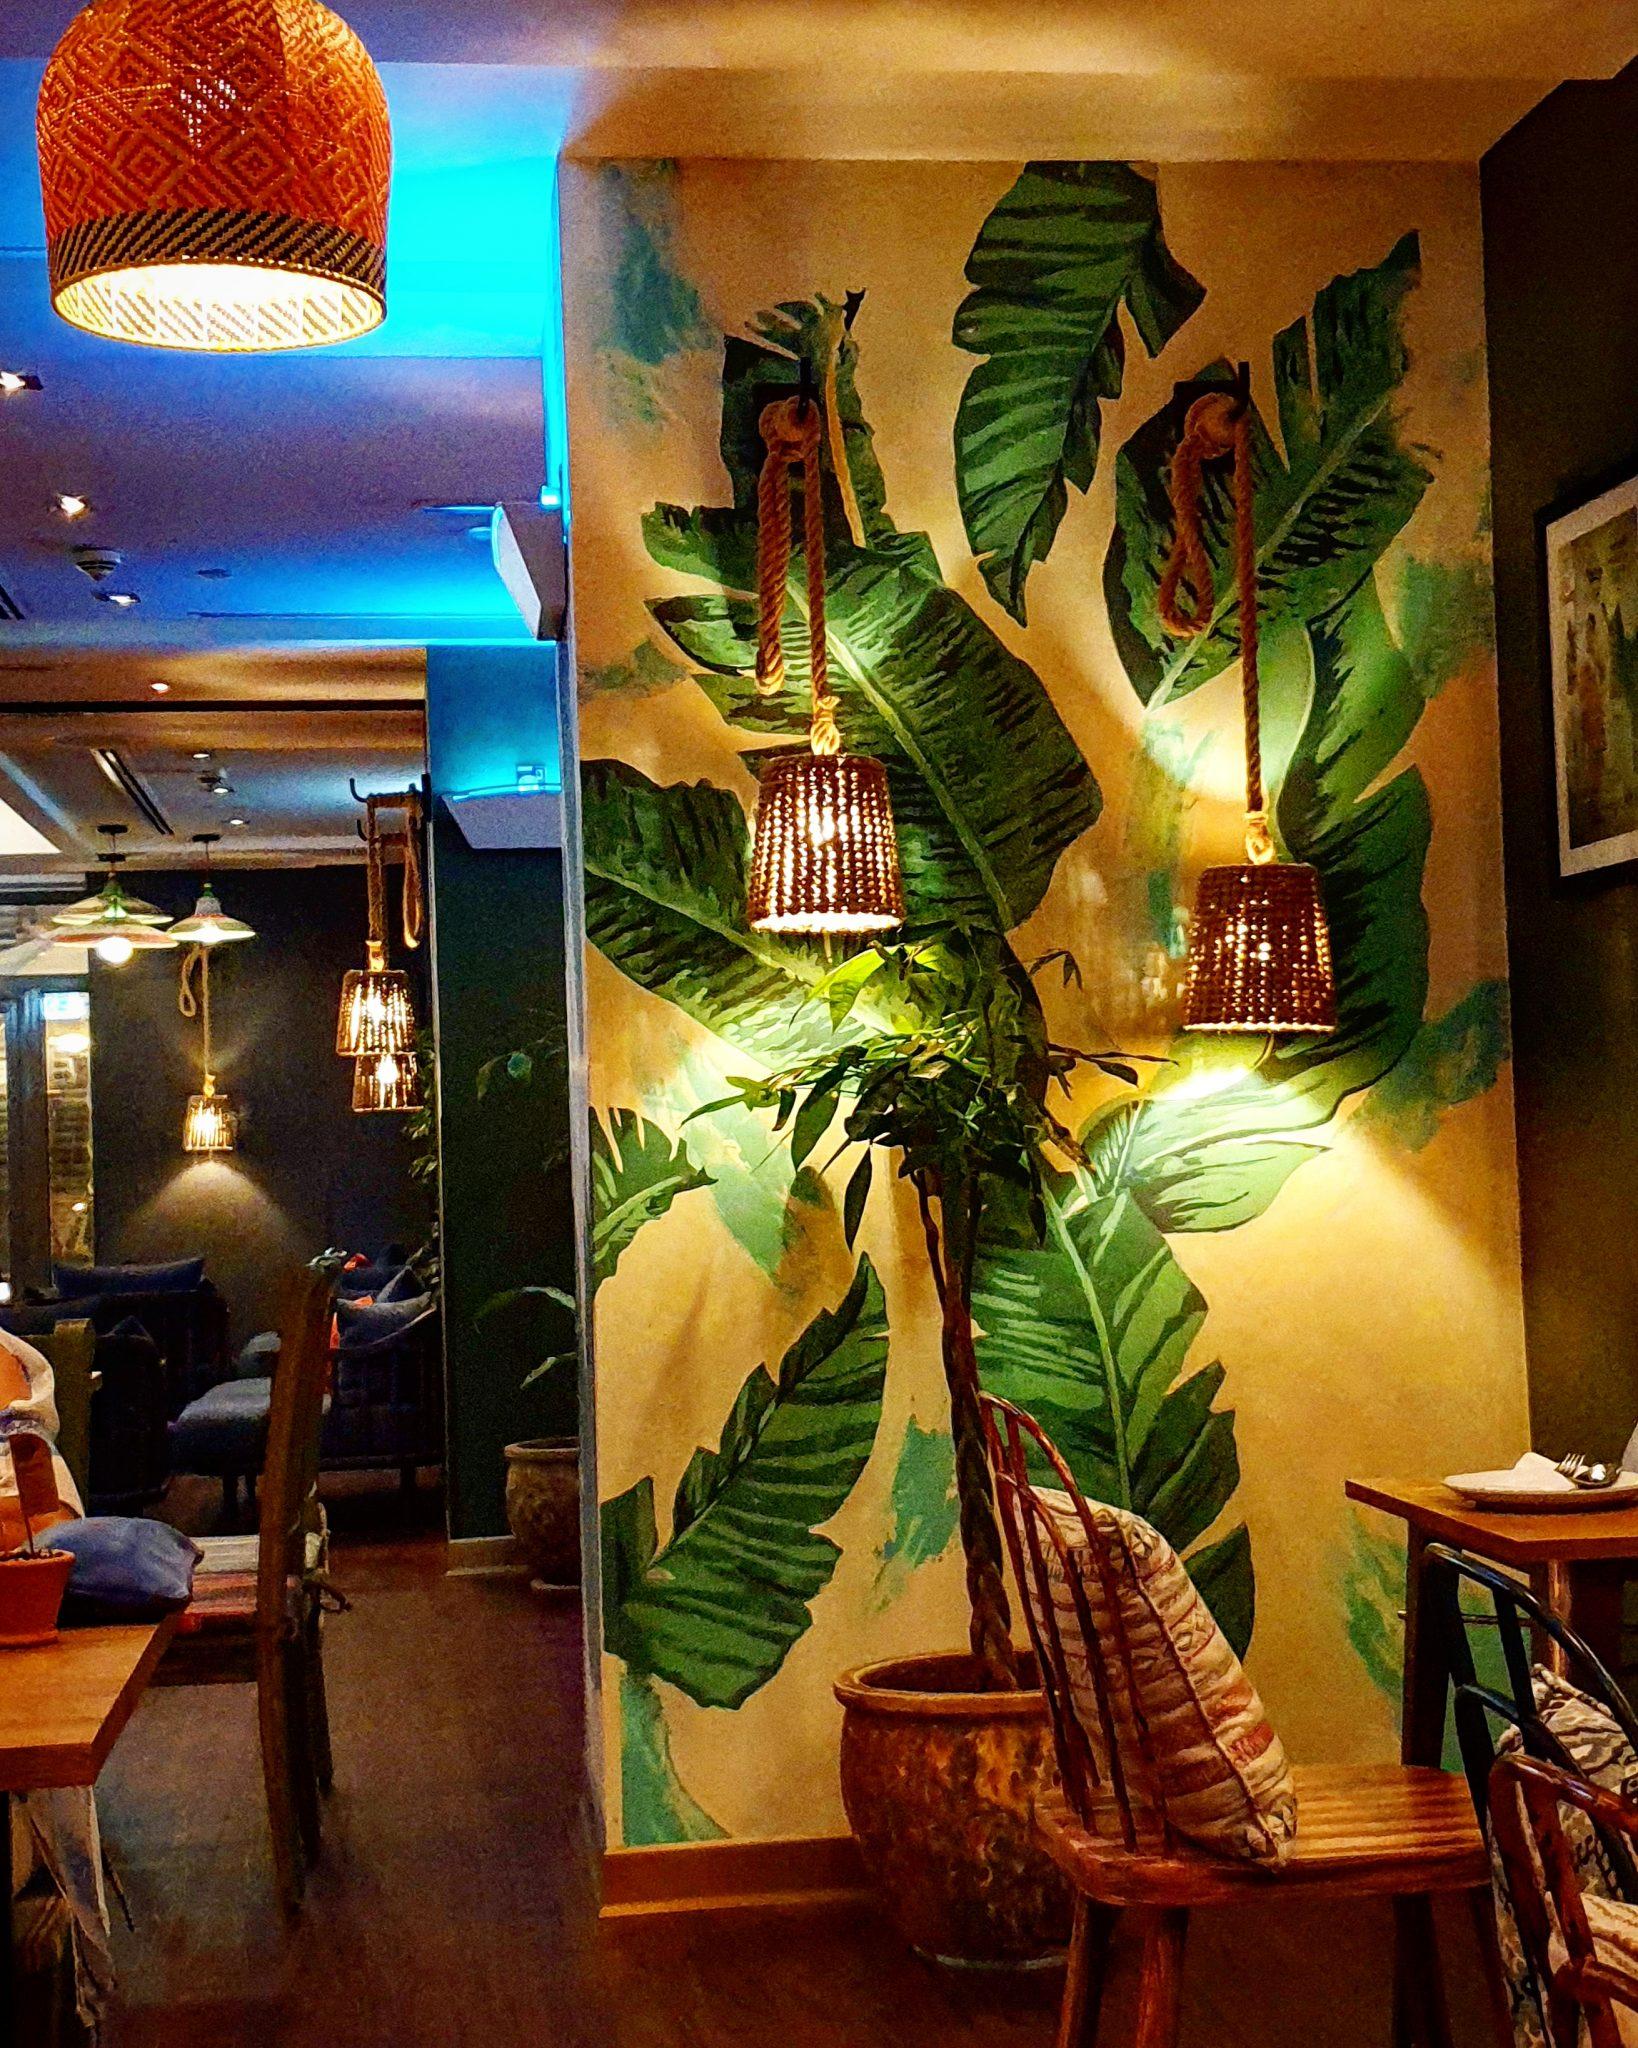 D Exhibition Jbr : Best restaurants in jbr the walk dubai u travel with me